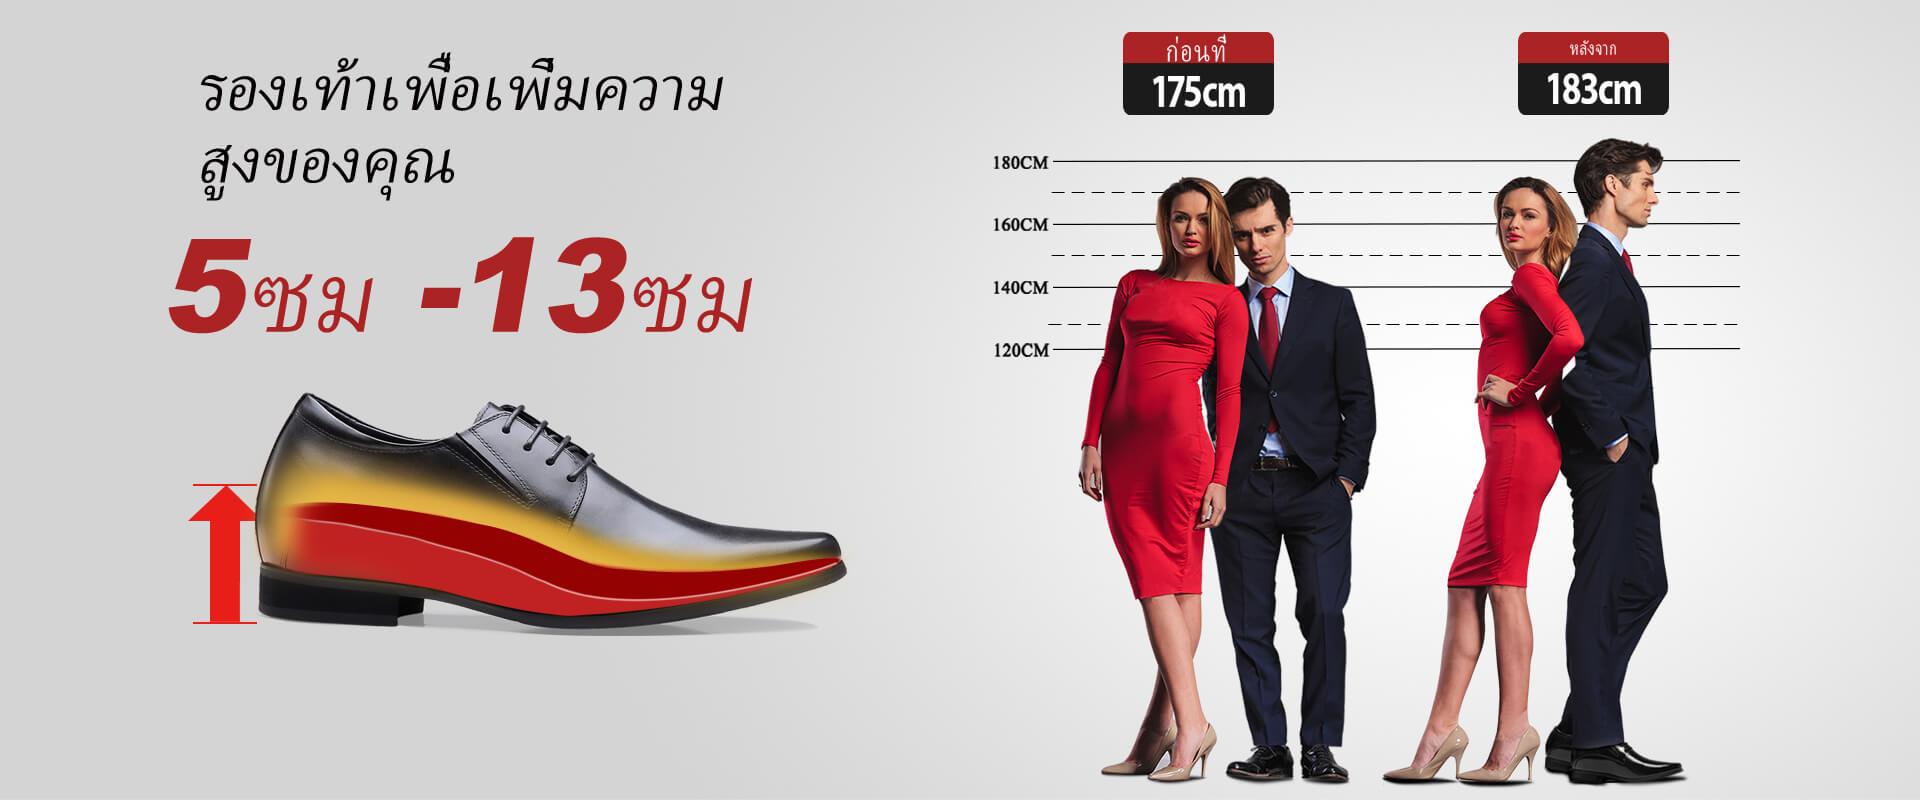 Tom Cruise elevstor shoes